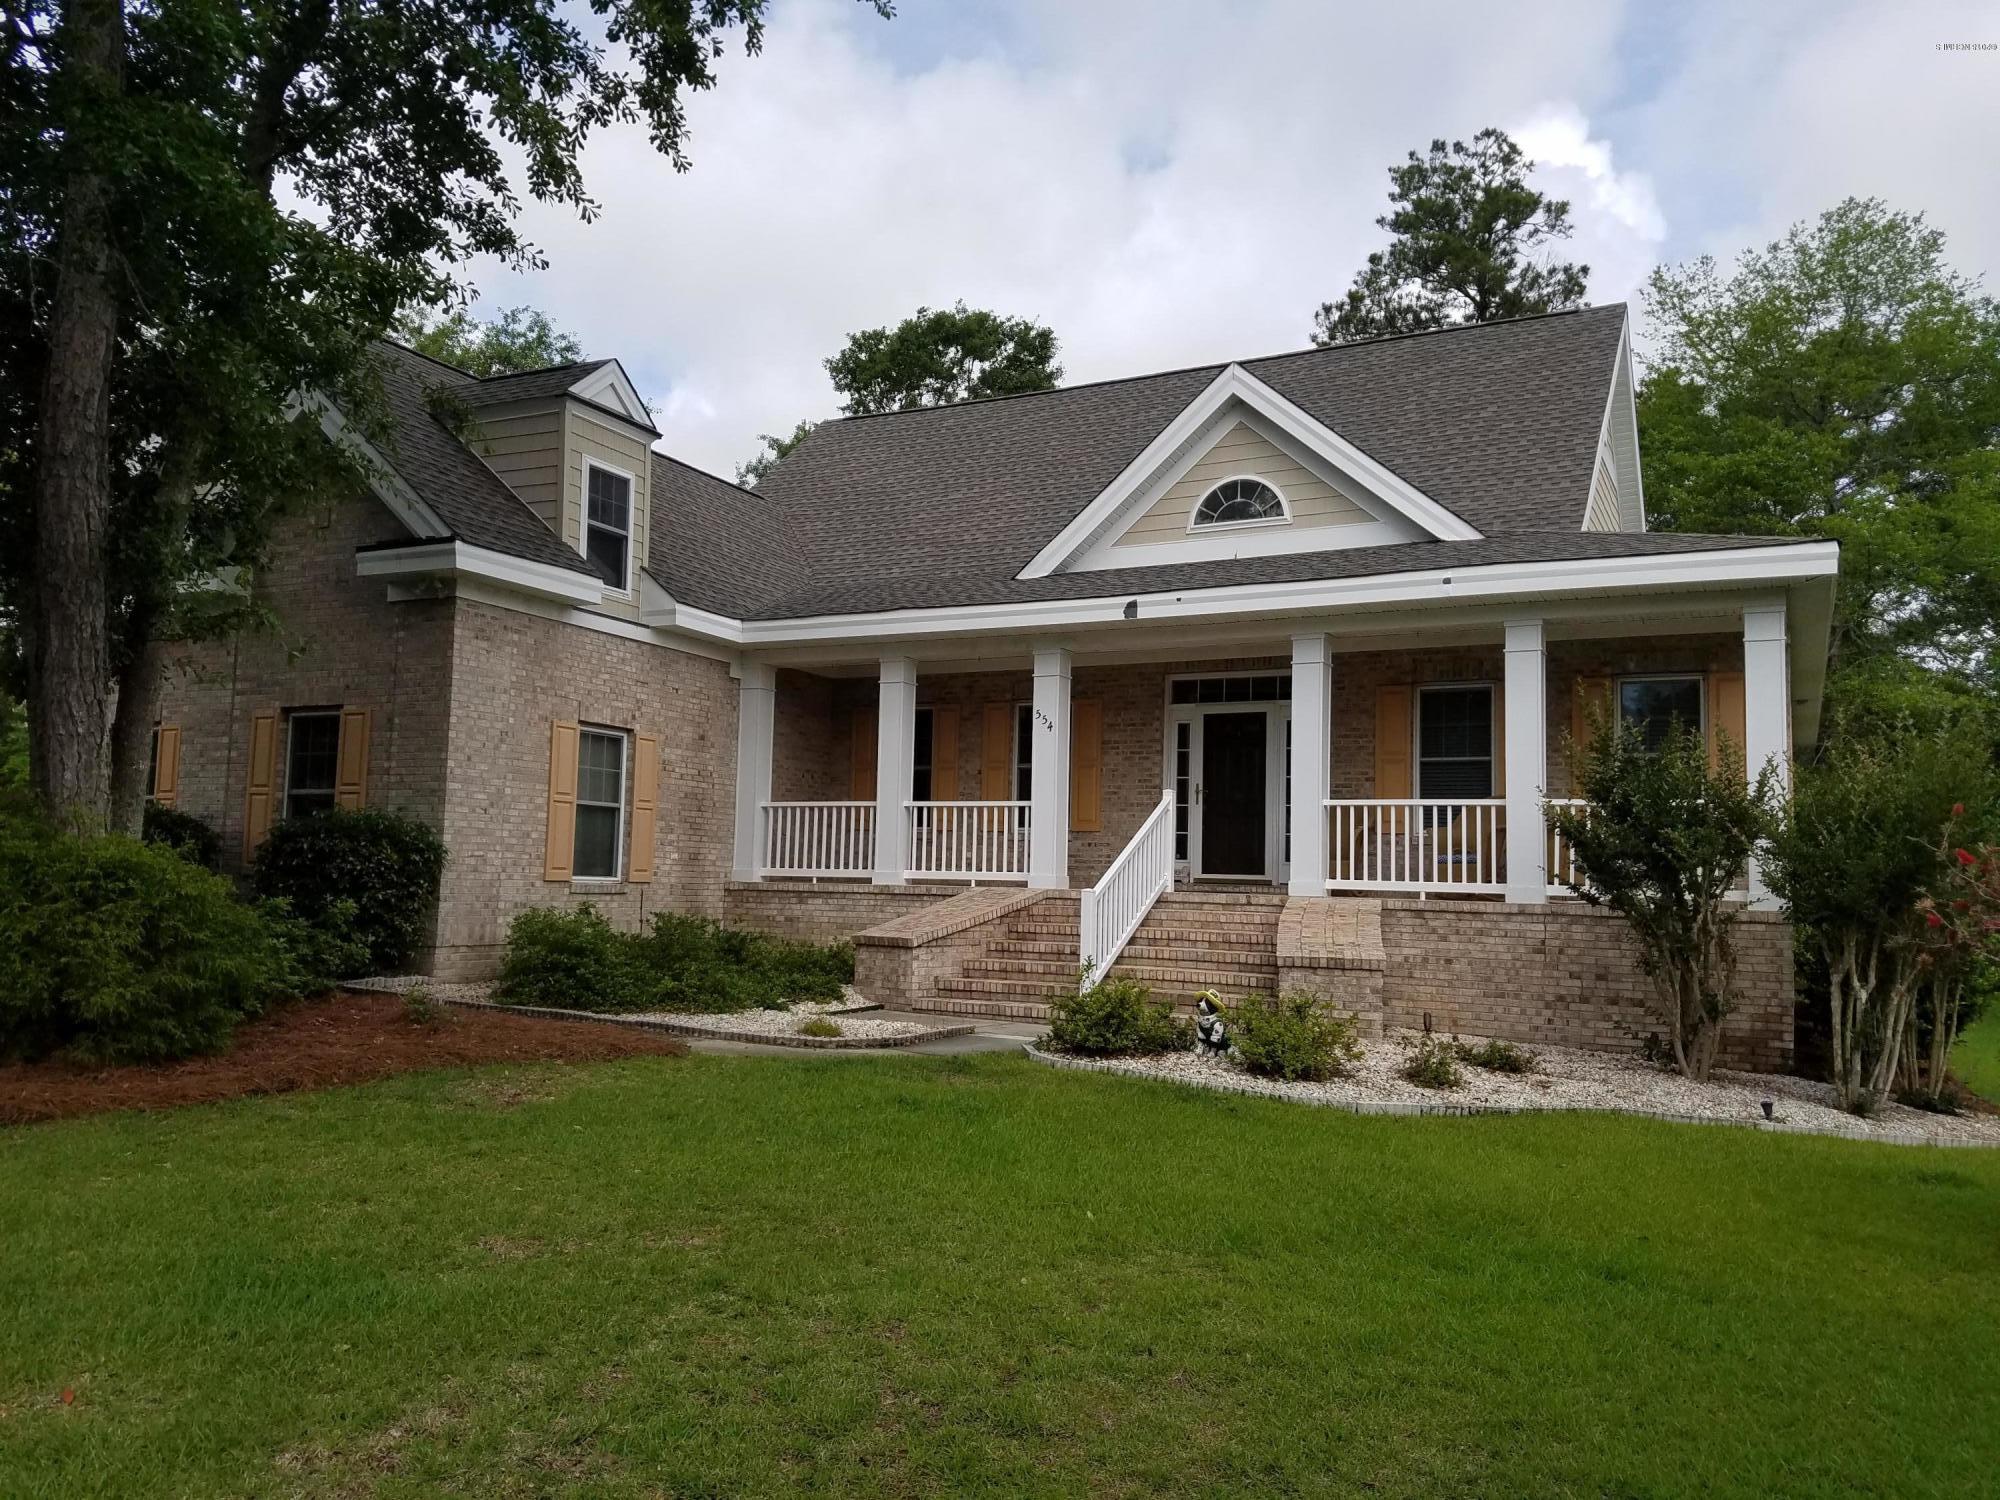 Carolina Plantations Real Estate - MLS Number: 100116406